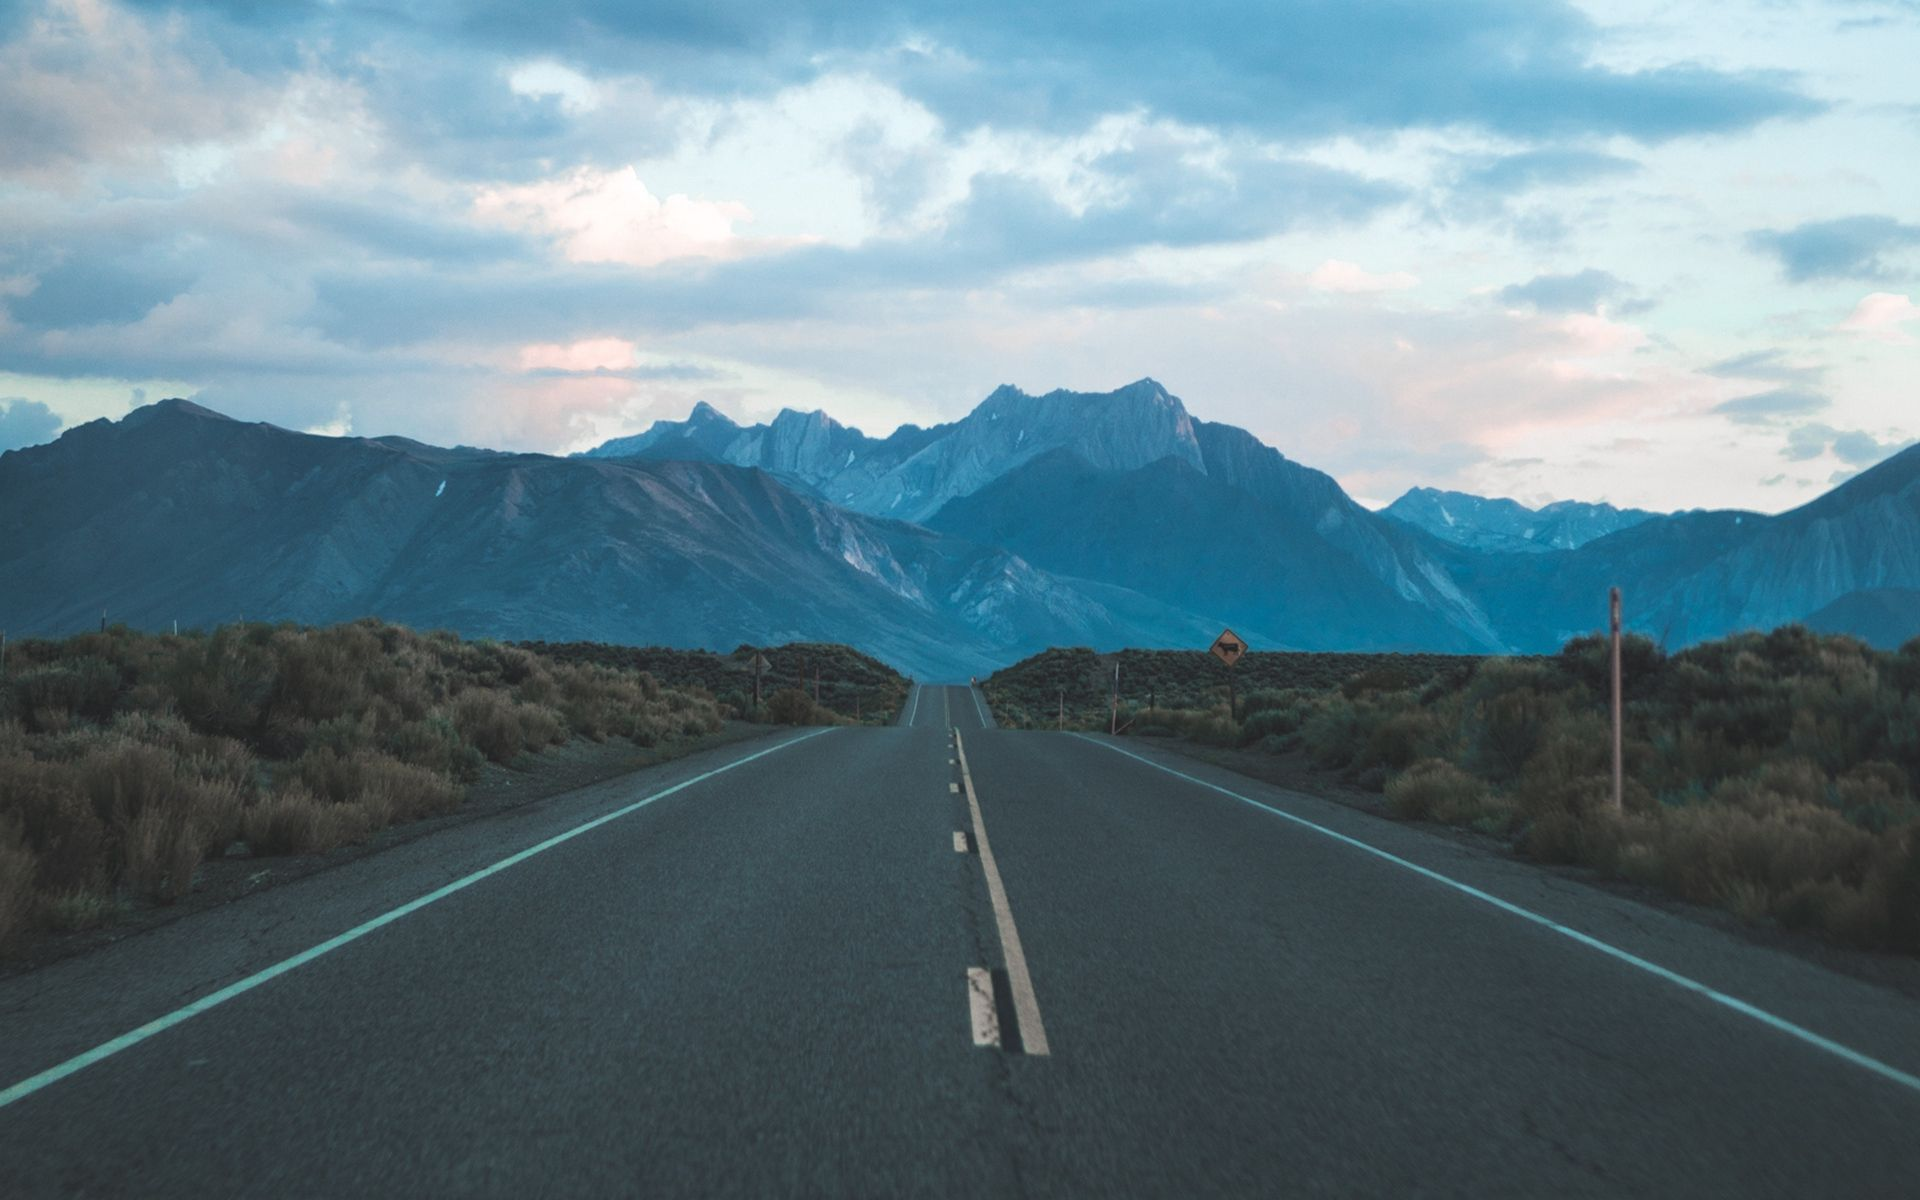 Mountain Road Background 1920x1200 Wallpaper Teahub Io